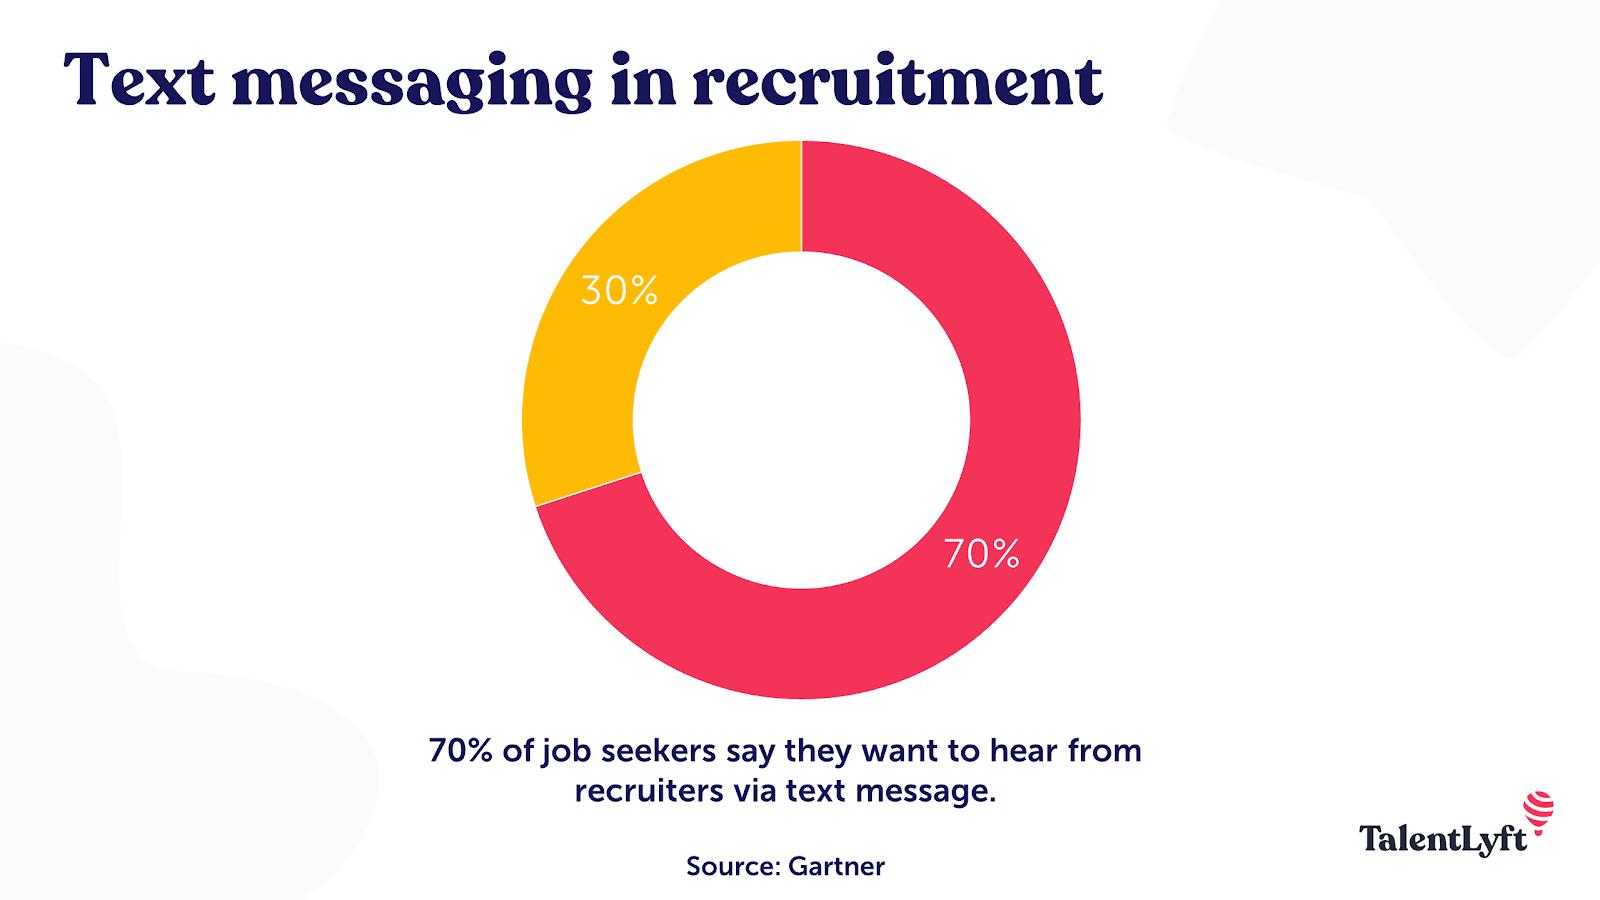 Text messaging in recruitment